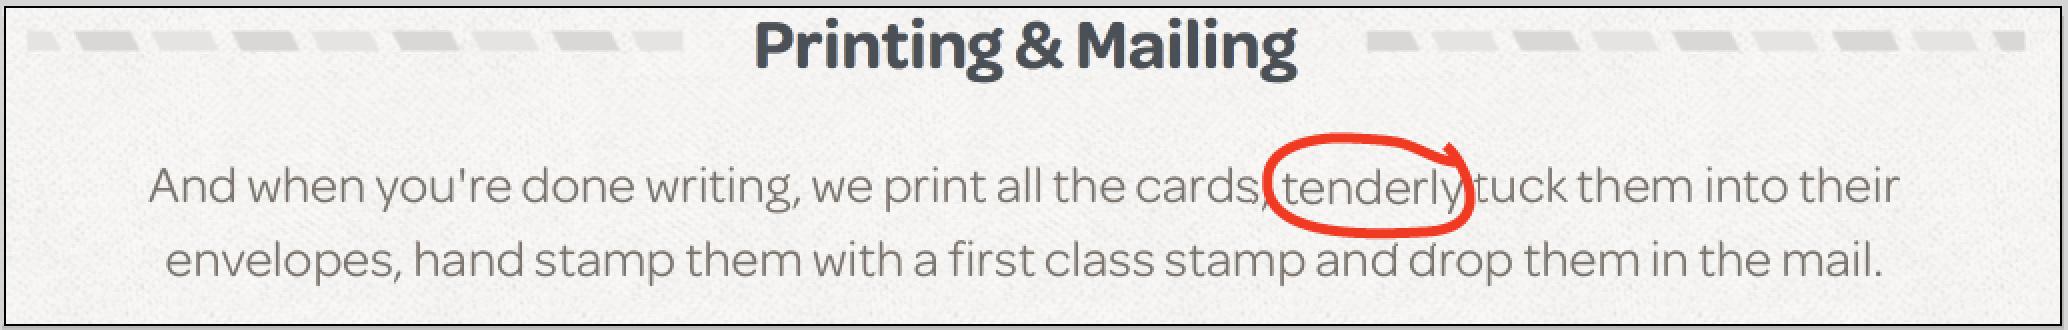 printing and mailing circle tenderly